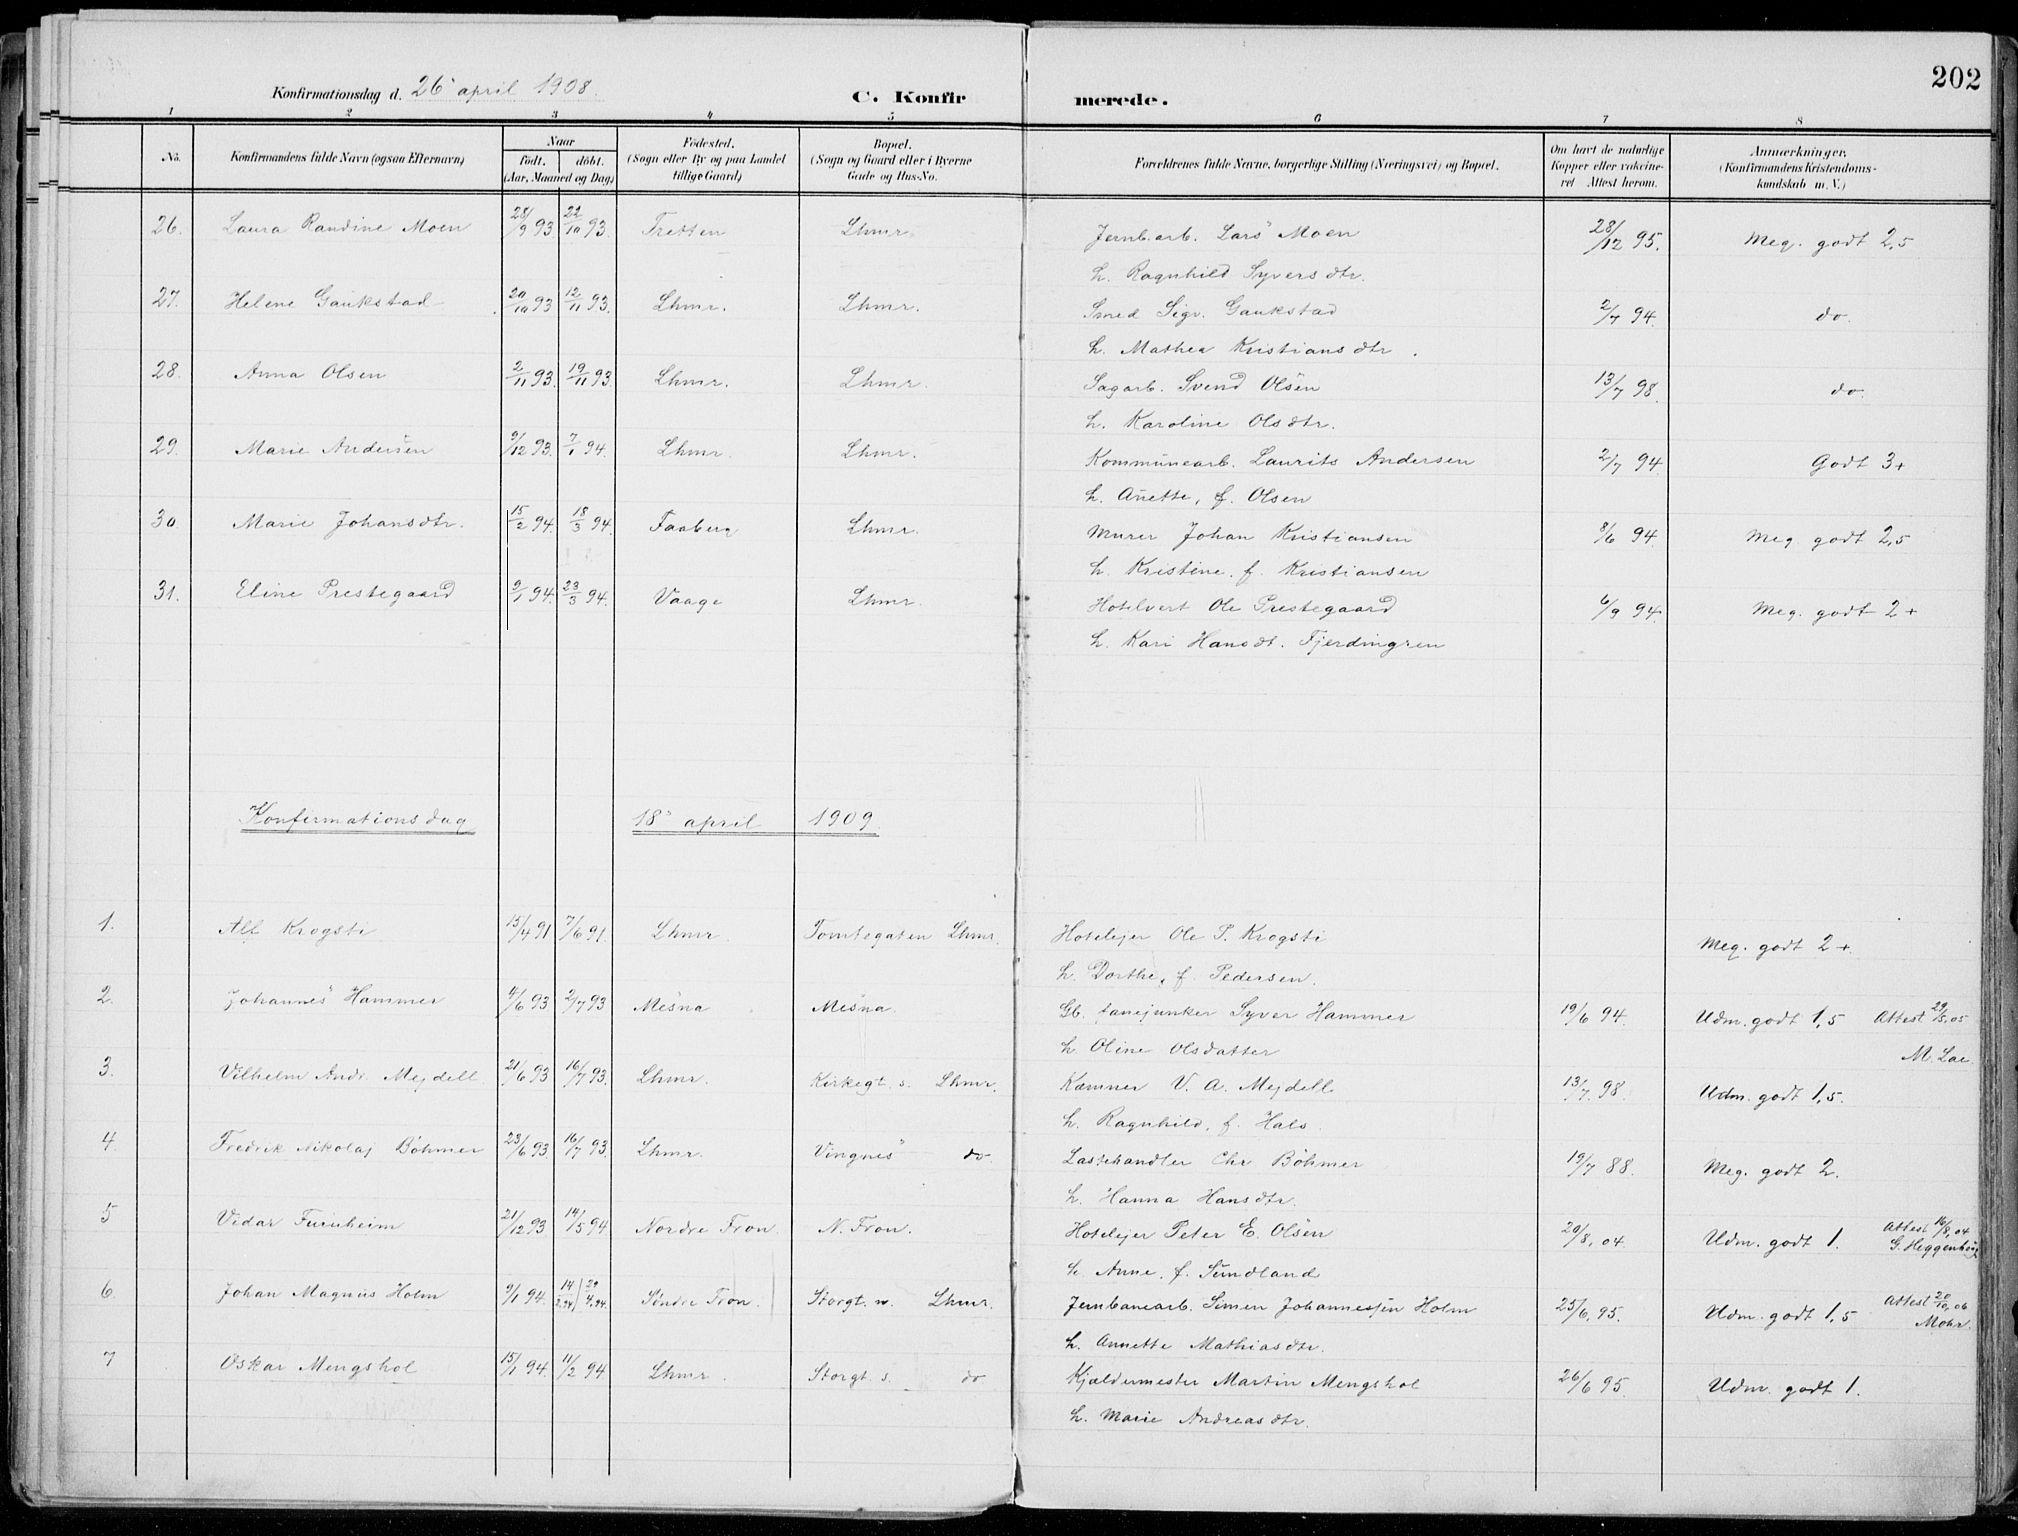 SAH, Lillehammer prestekontor, Ministerialbok nr. 1, 1901-1916, s. 202